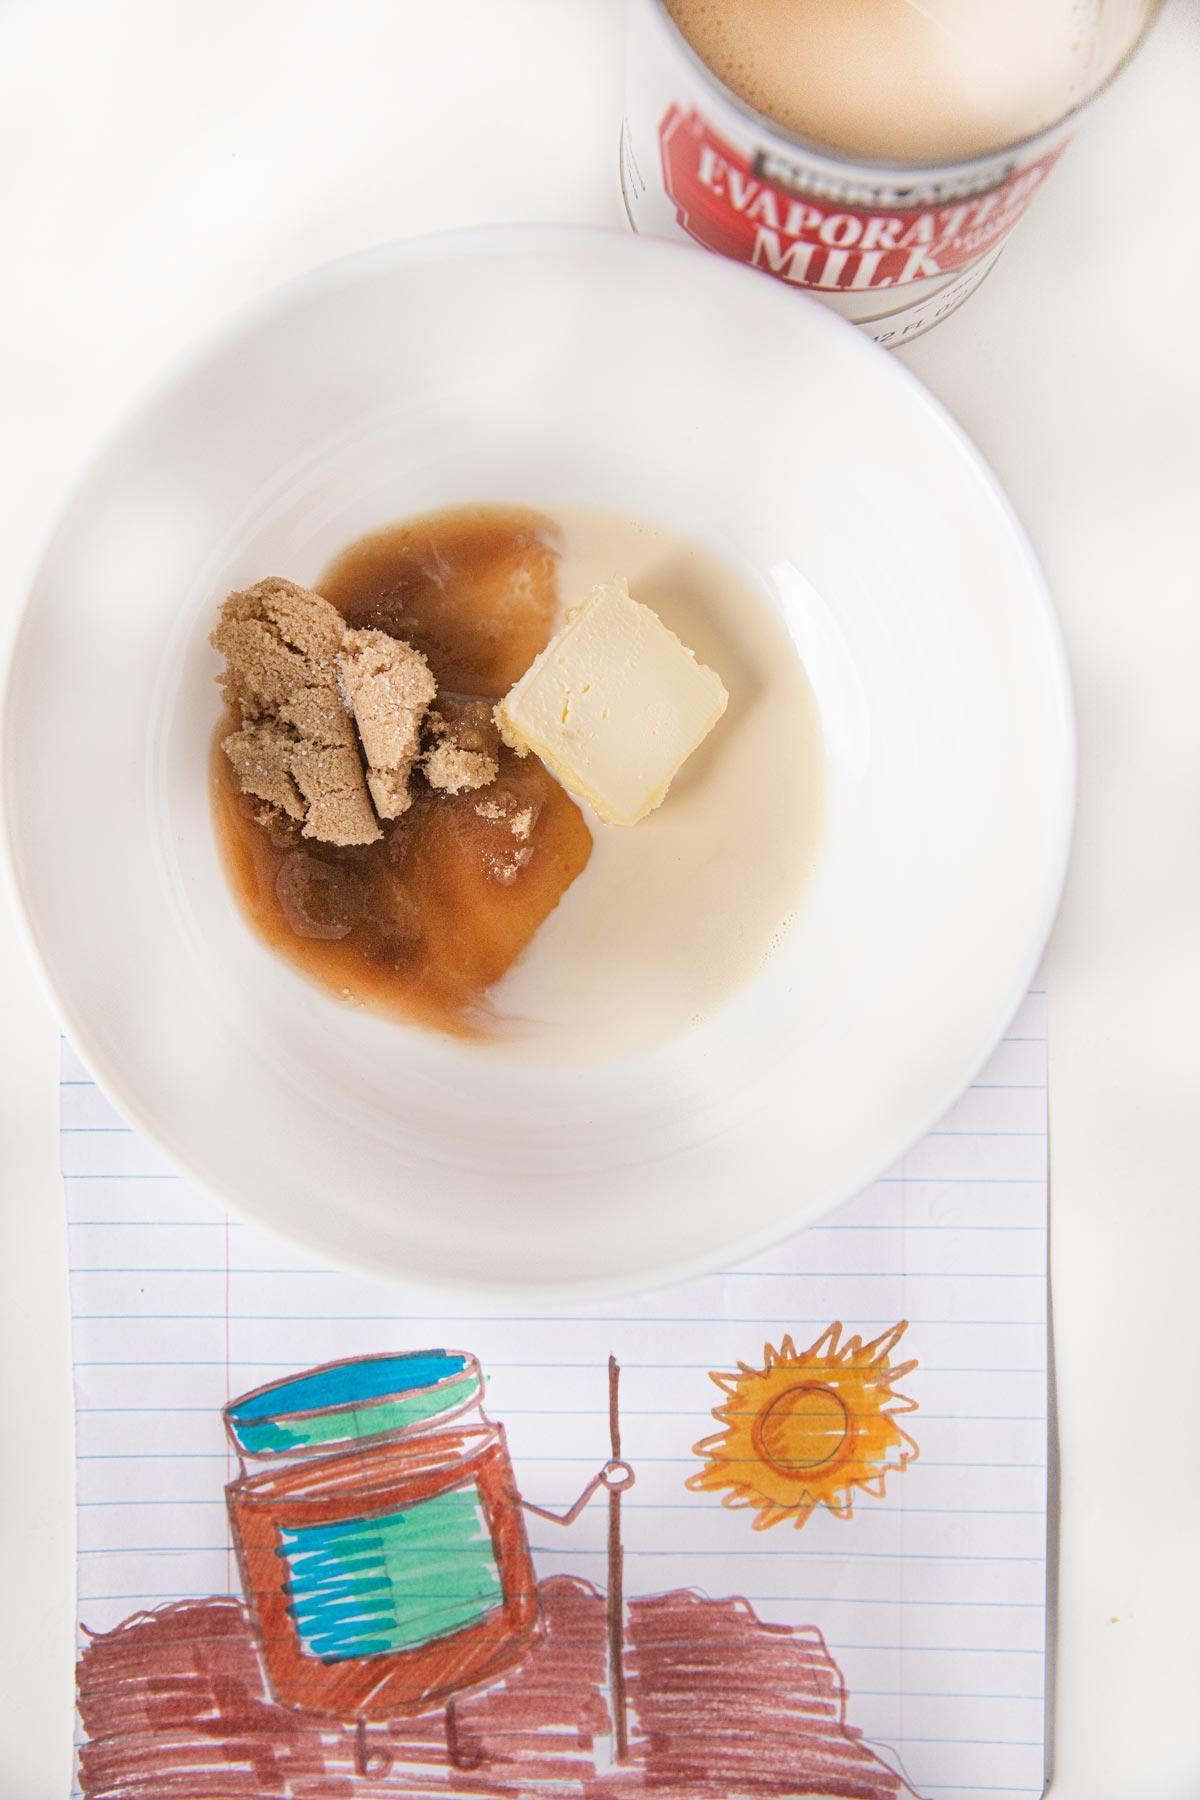 Microwave Caramel Sauce ingredients in bowl